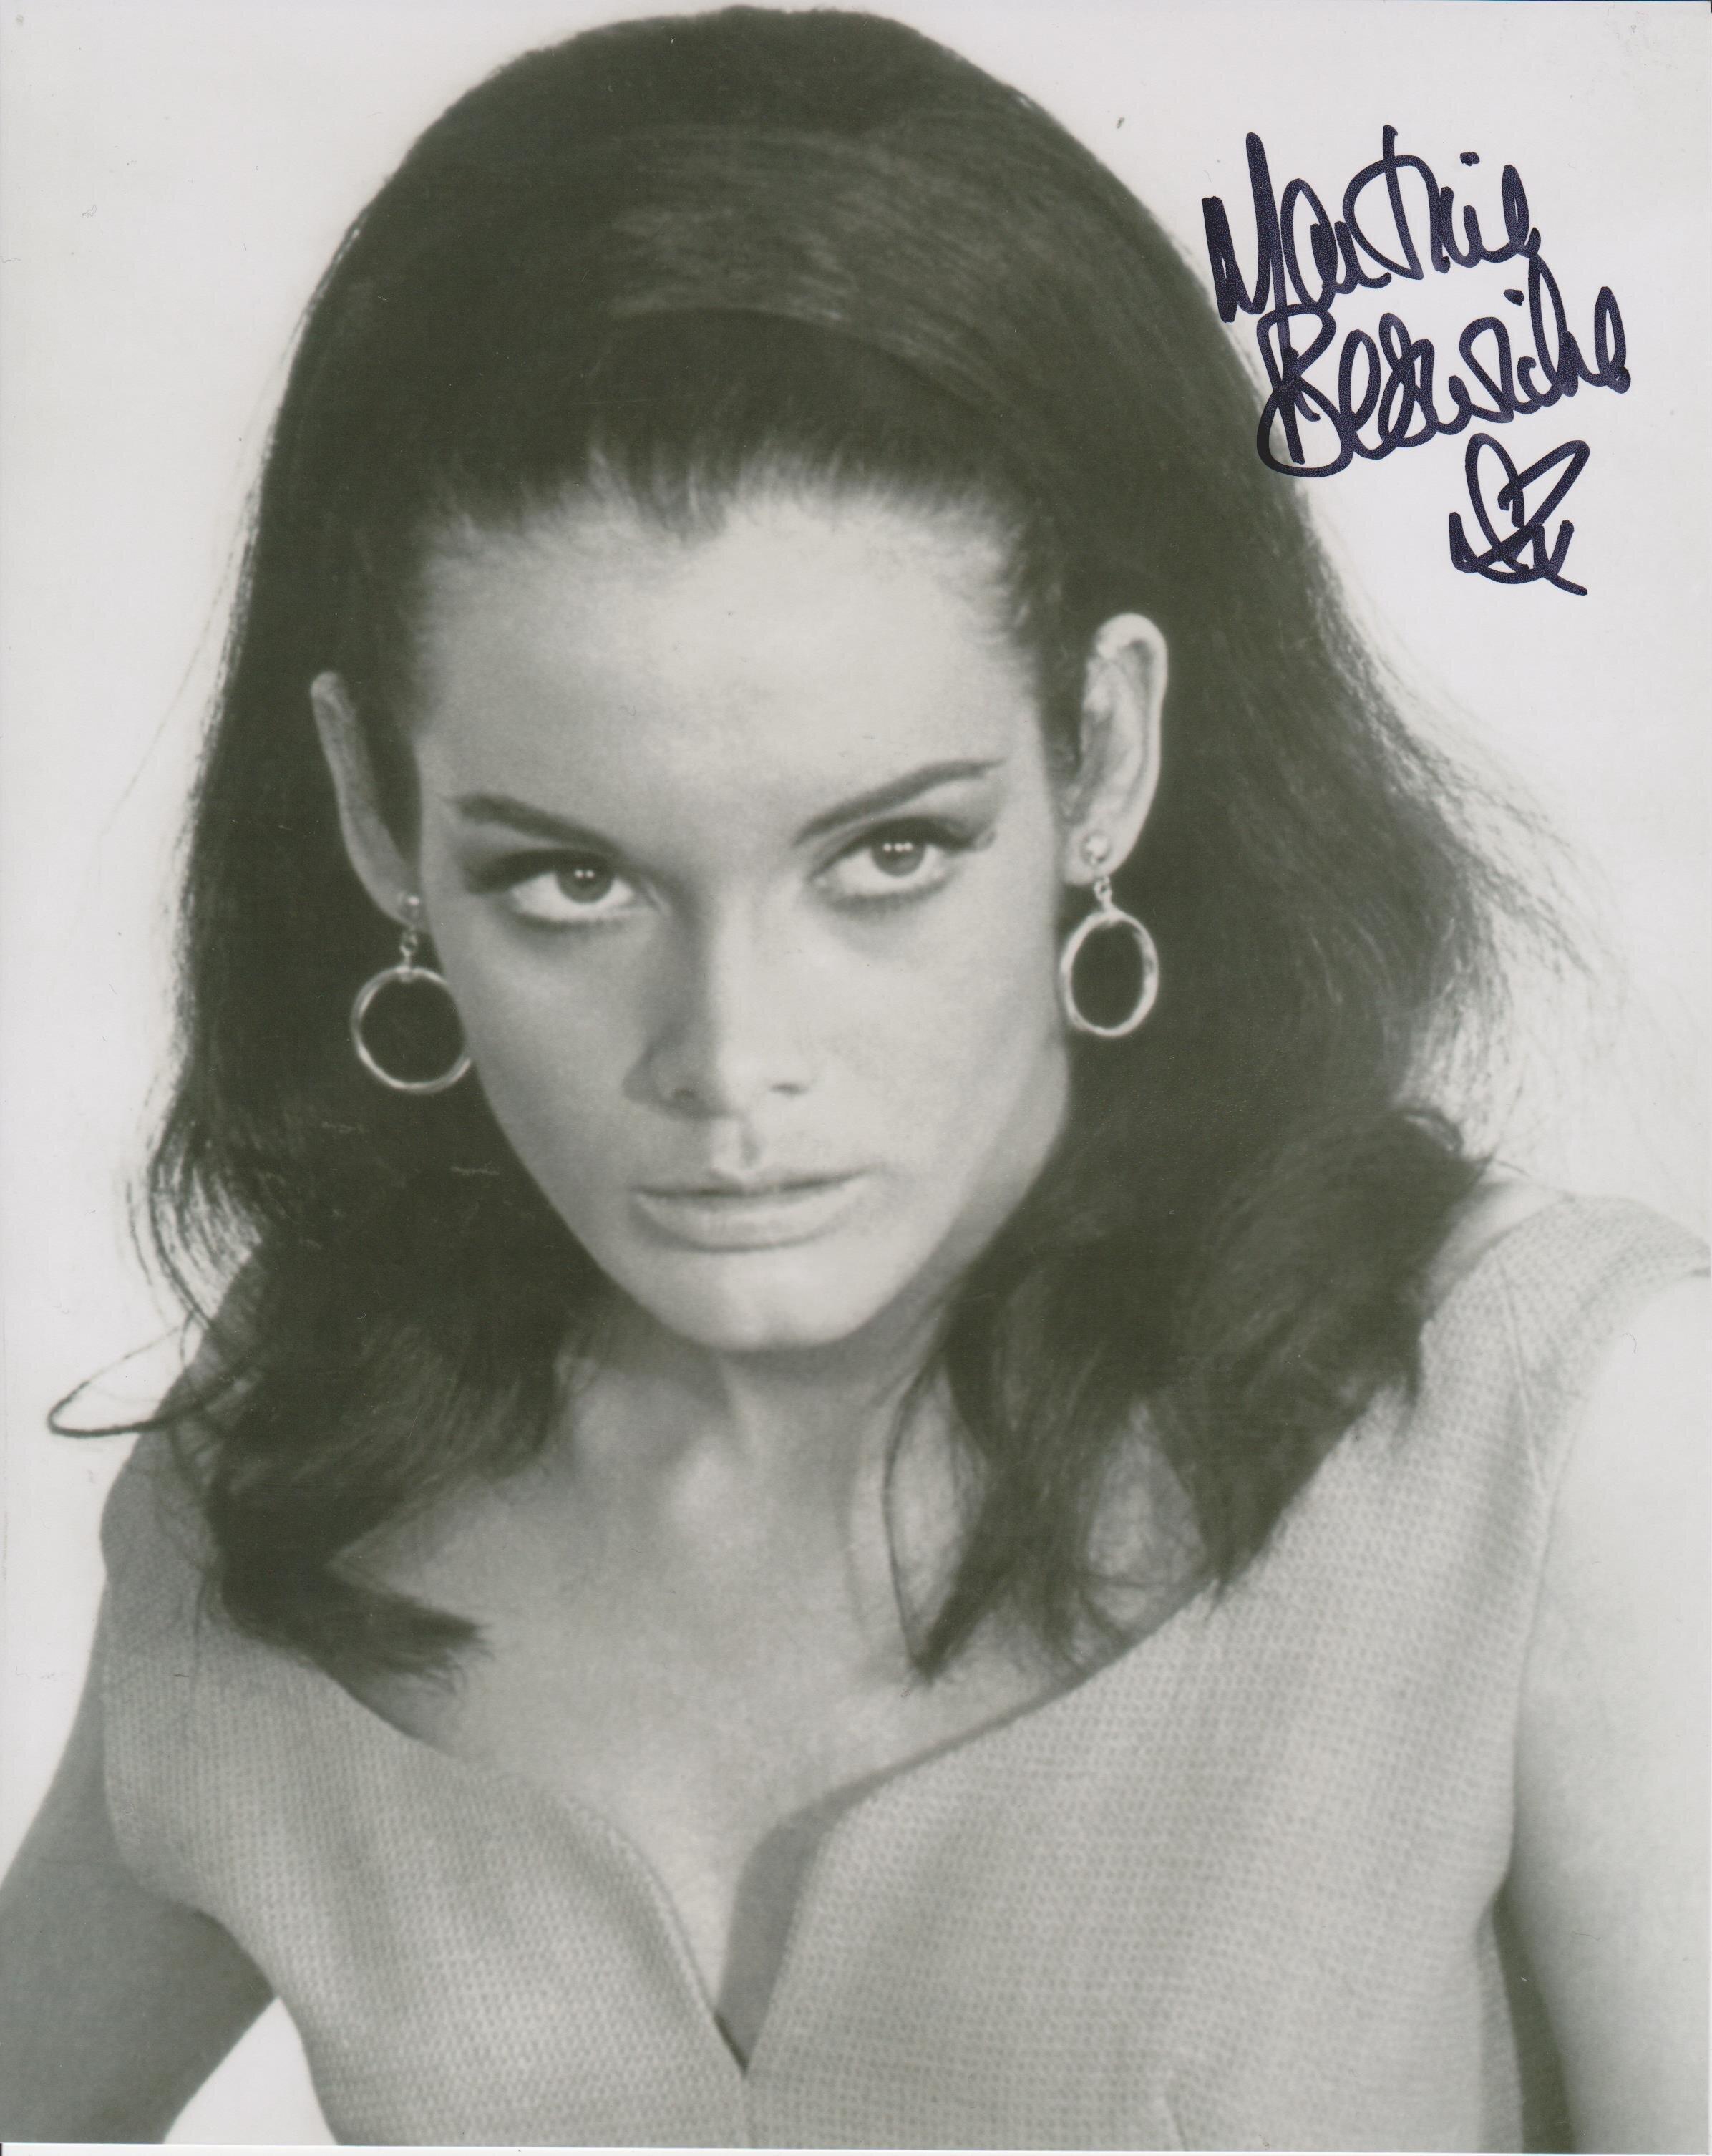 Gale Sondergaard,Sindhu Erotic photos Jonathan Hyde (born 1948),Veronica Hamel born November 20, 1943 (age 74)